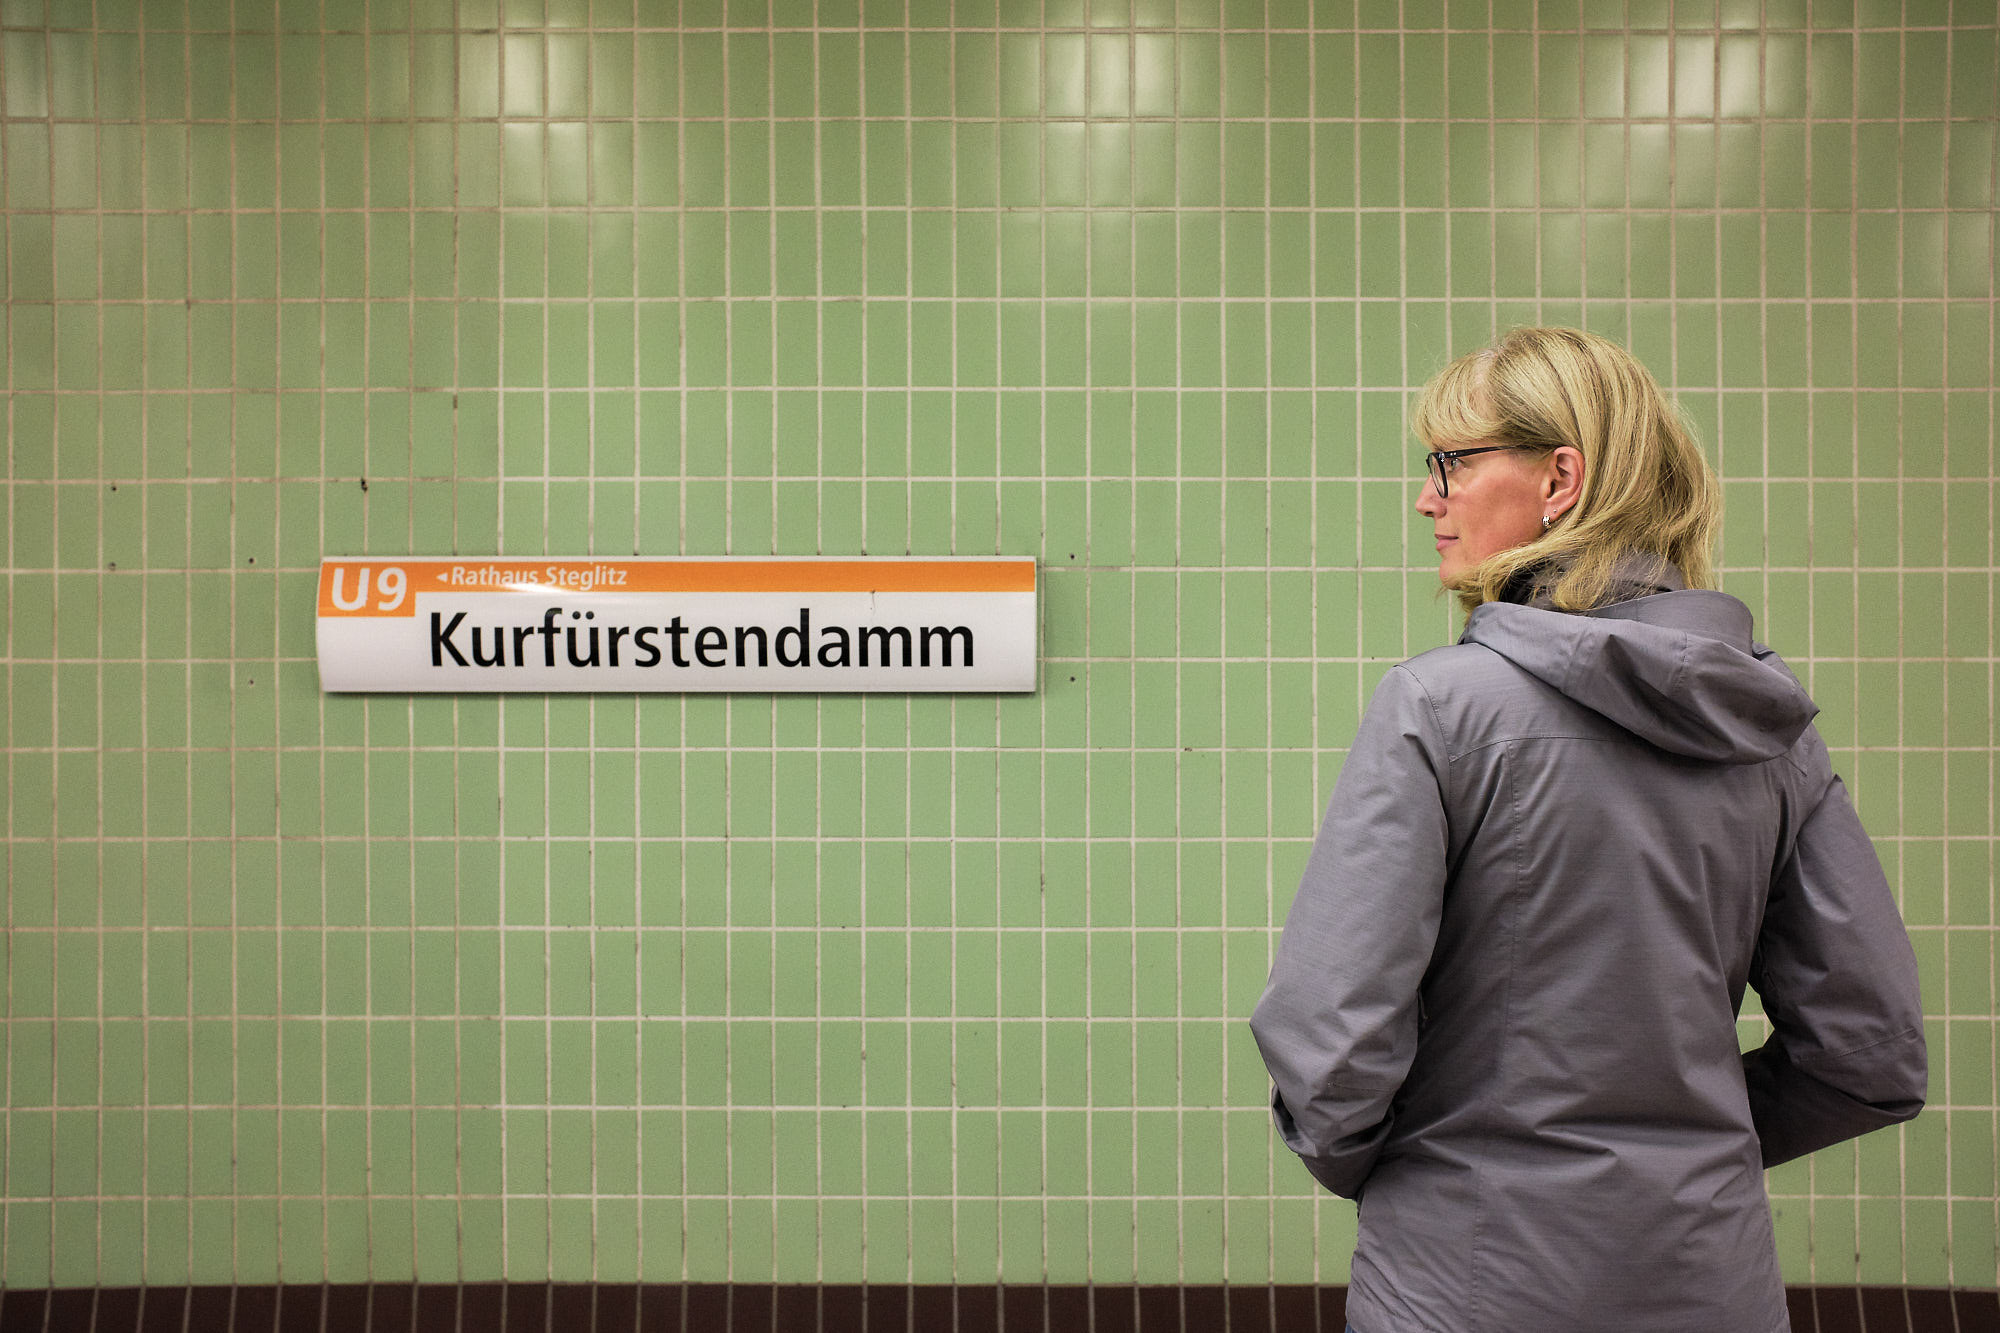 Photoauge / Kurfürstendamm